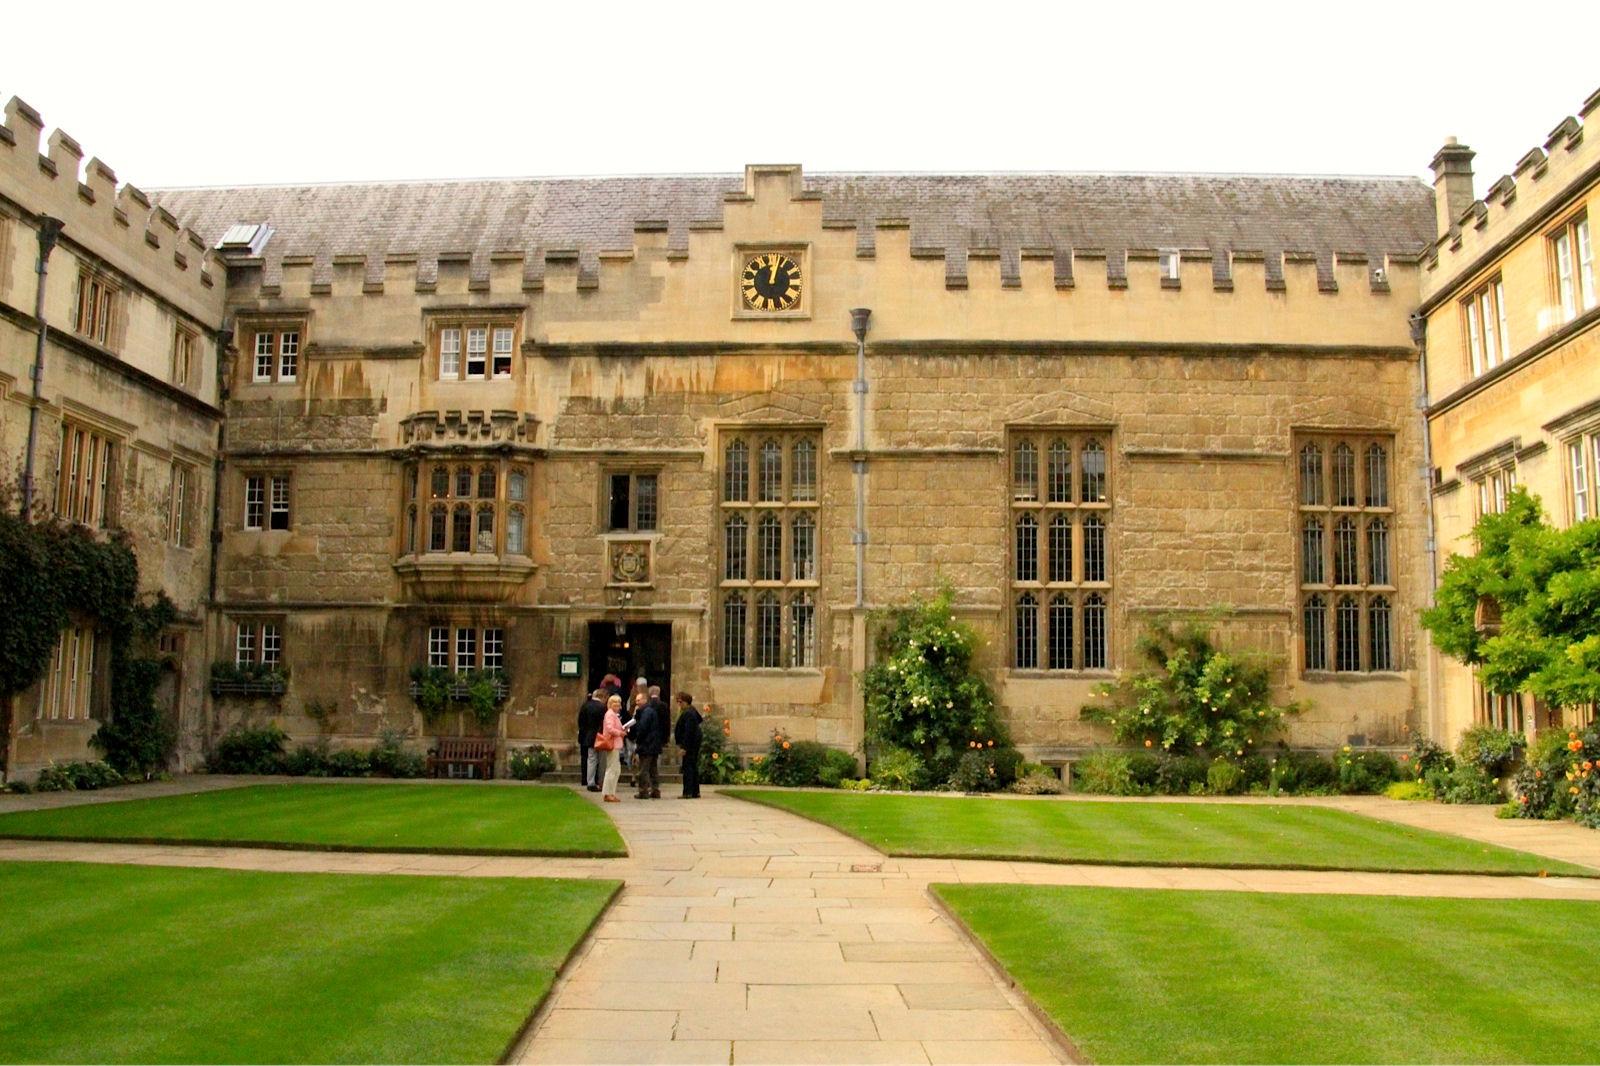 Jesus College - Quadrangle - Entrance to Dining Hall